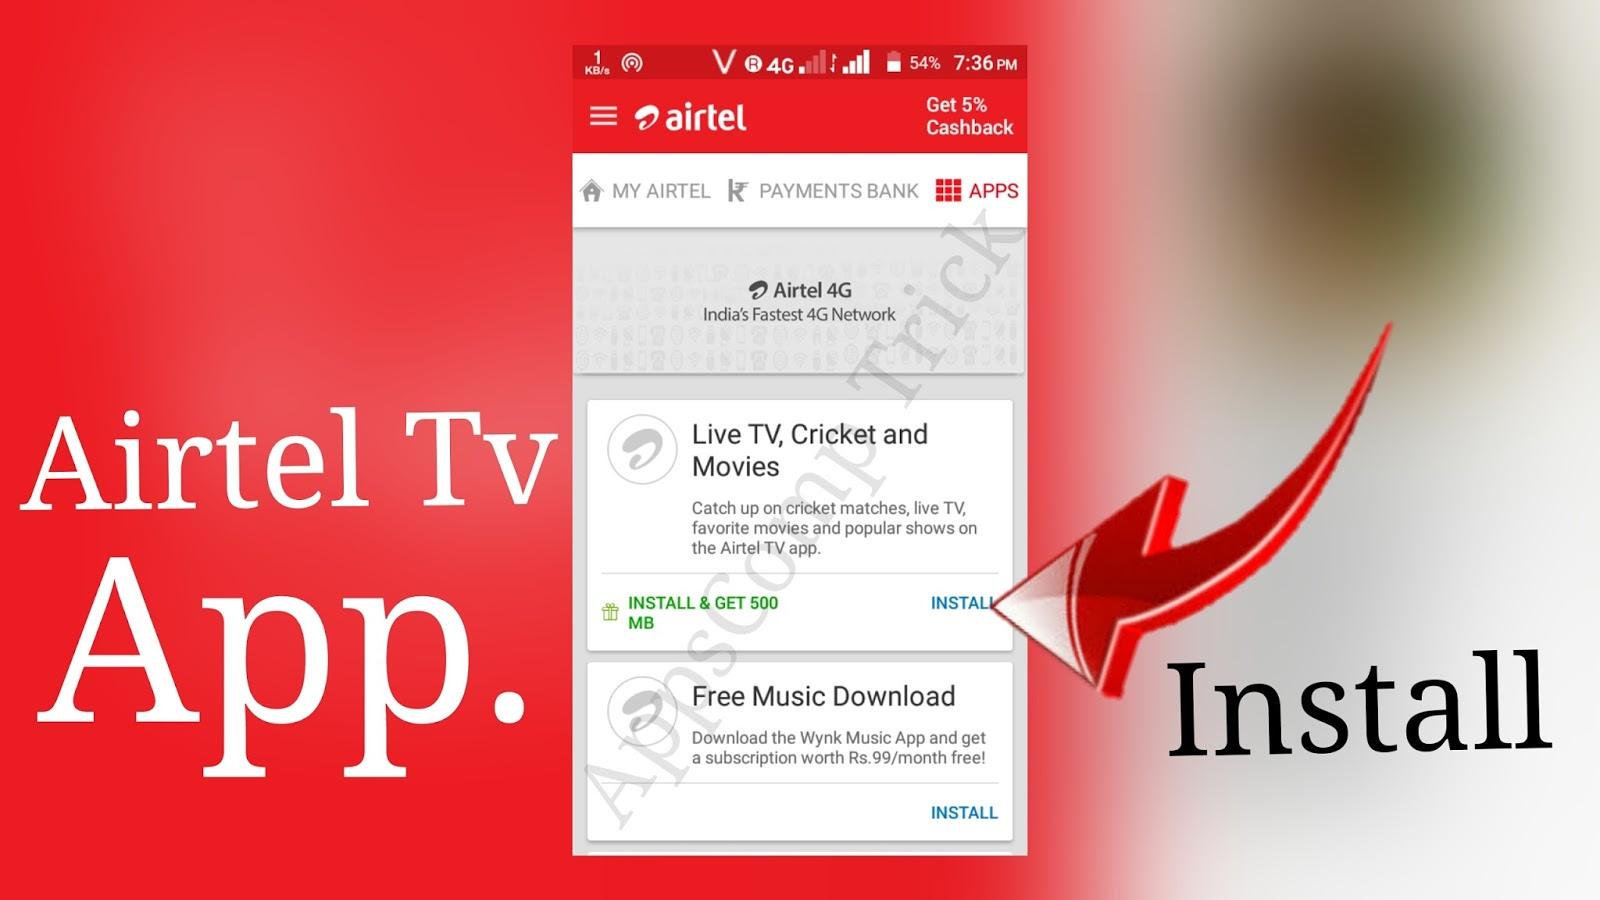 my airtel tv apps